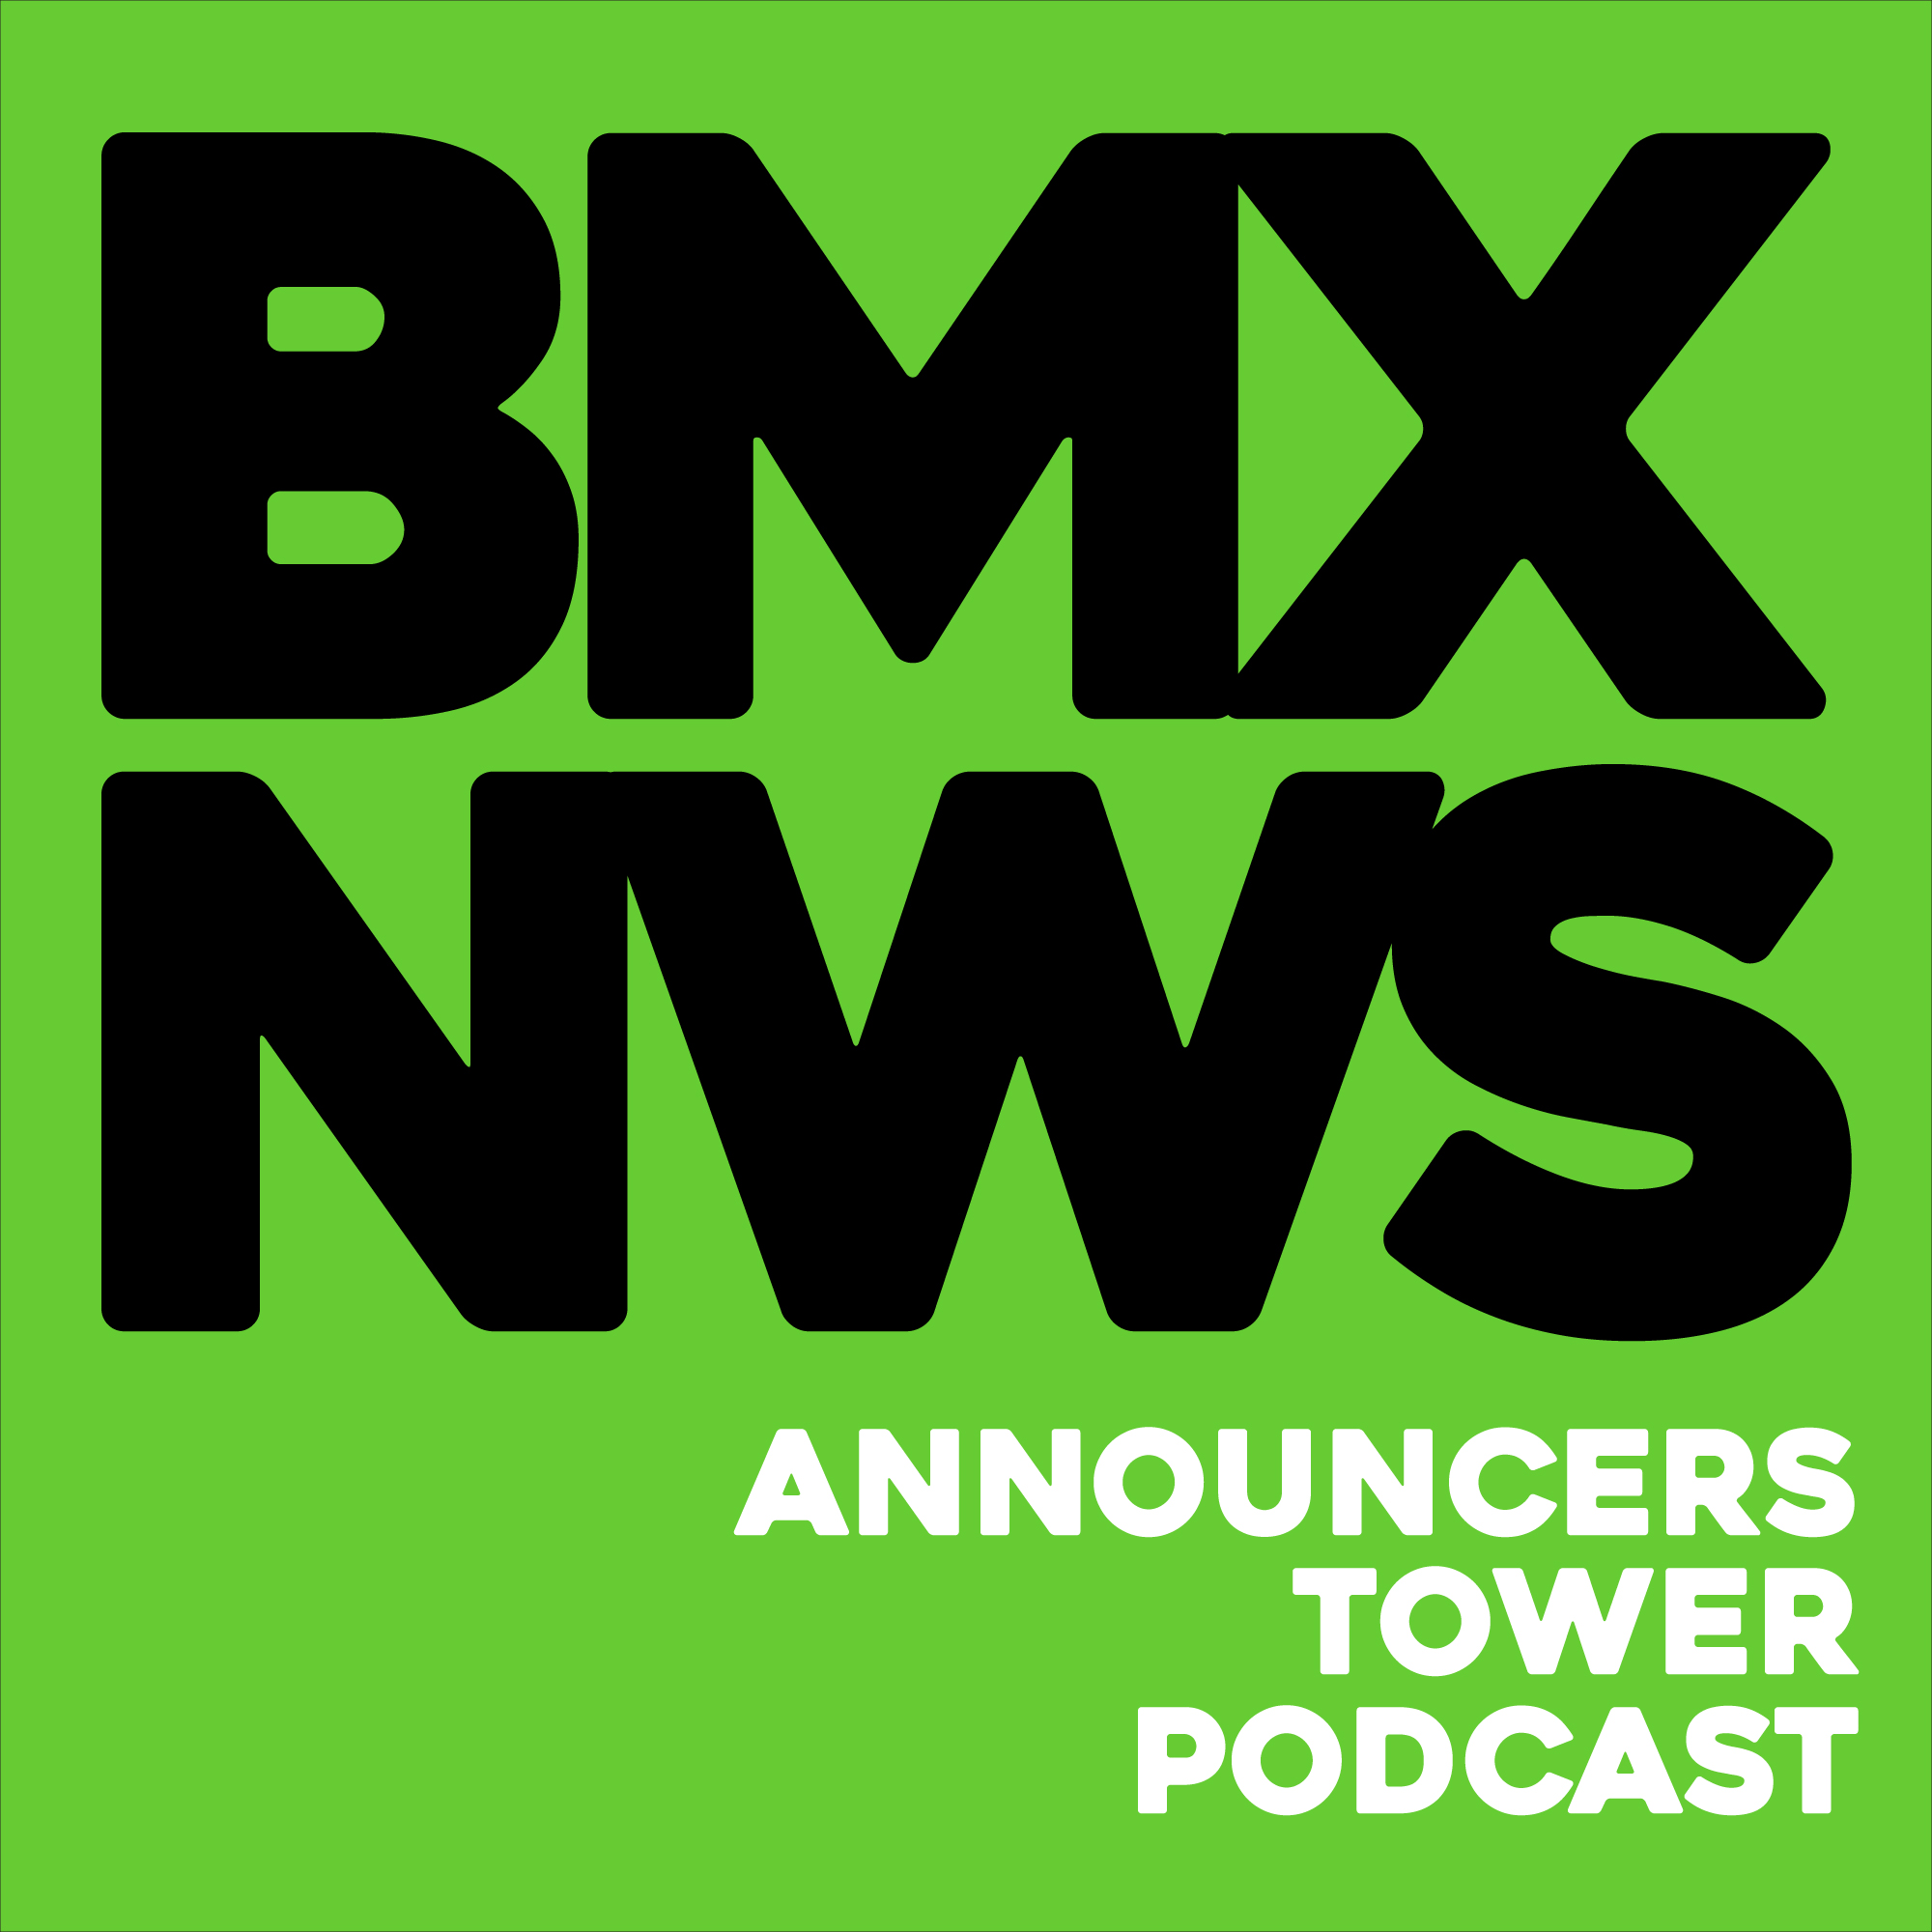 BMX News Announcers Tower Podcast show art